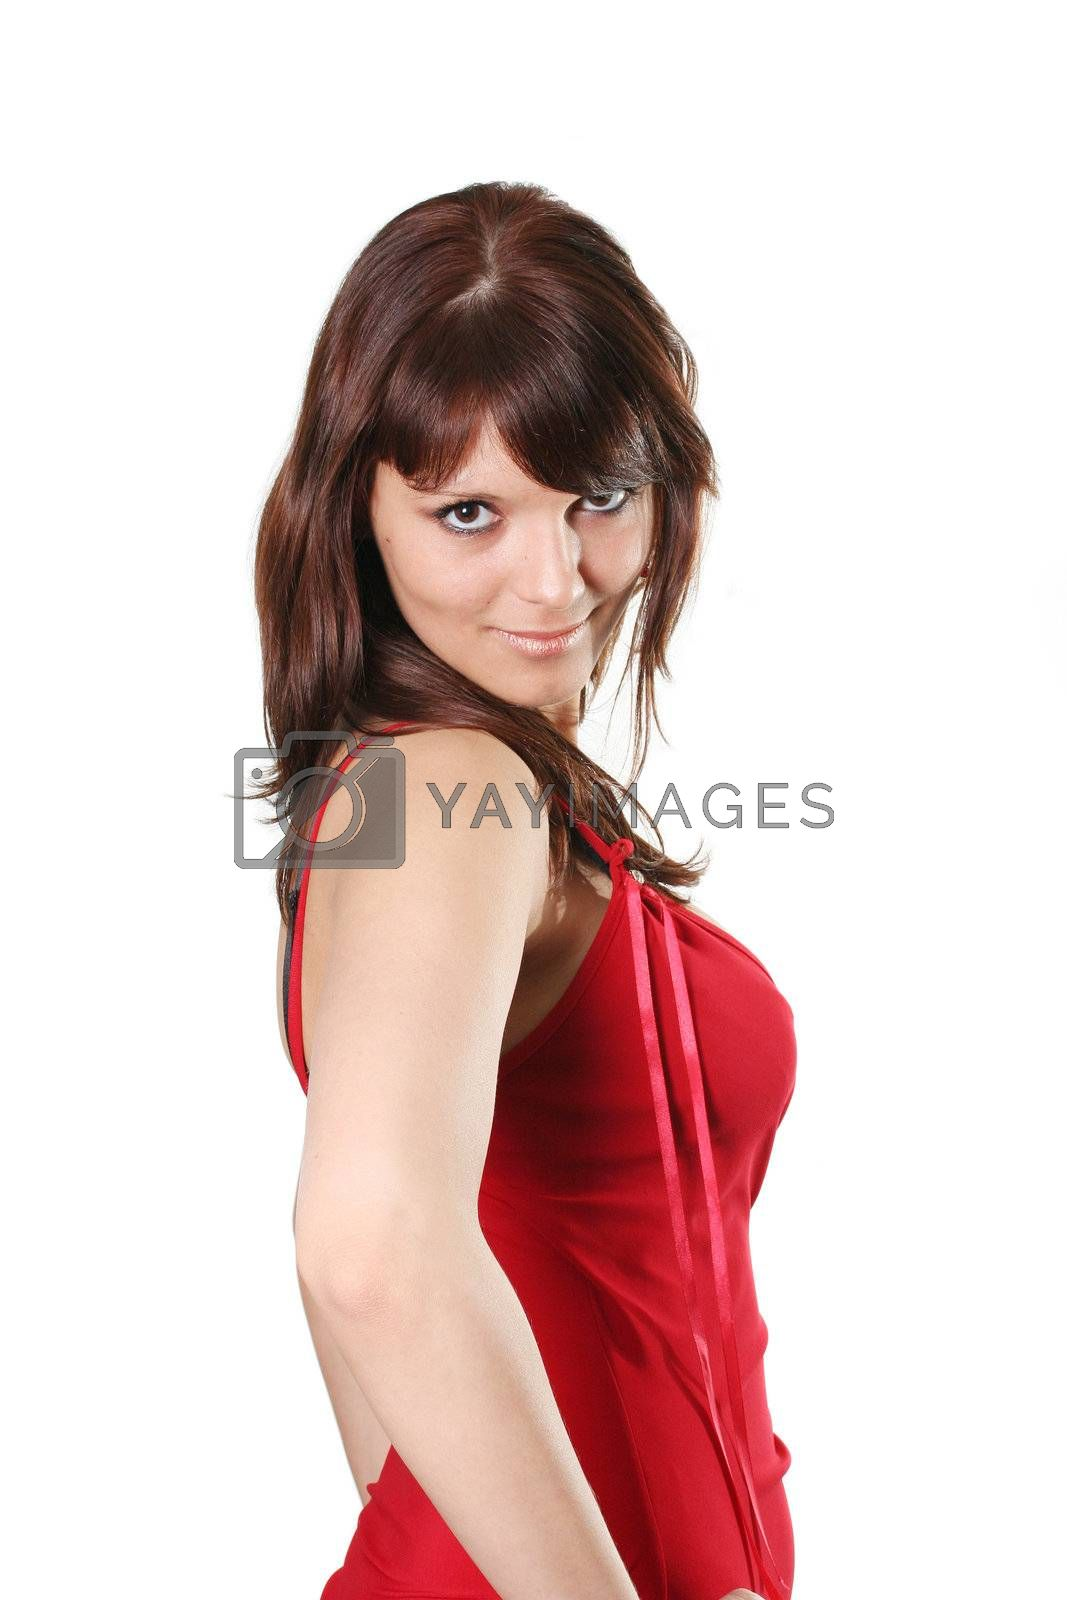 young person beauty girls lifestyles beautiful sensuality